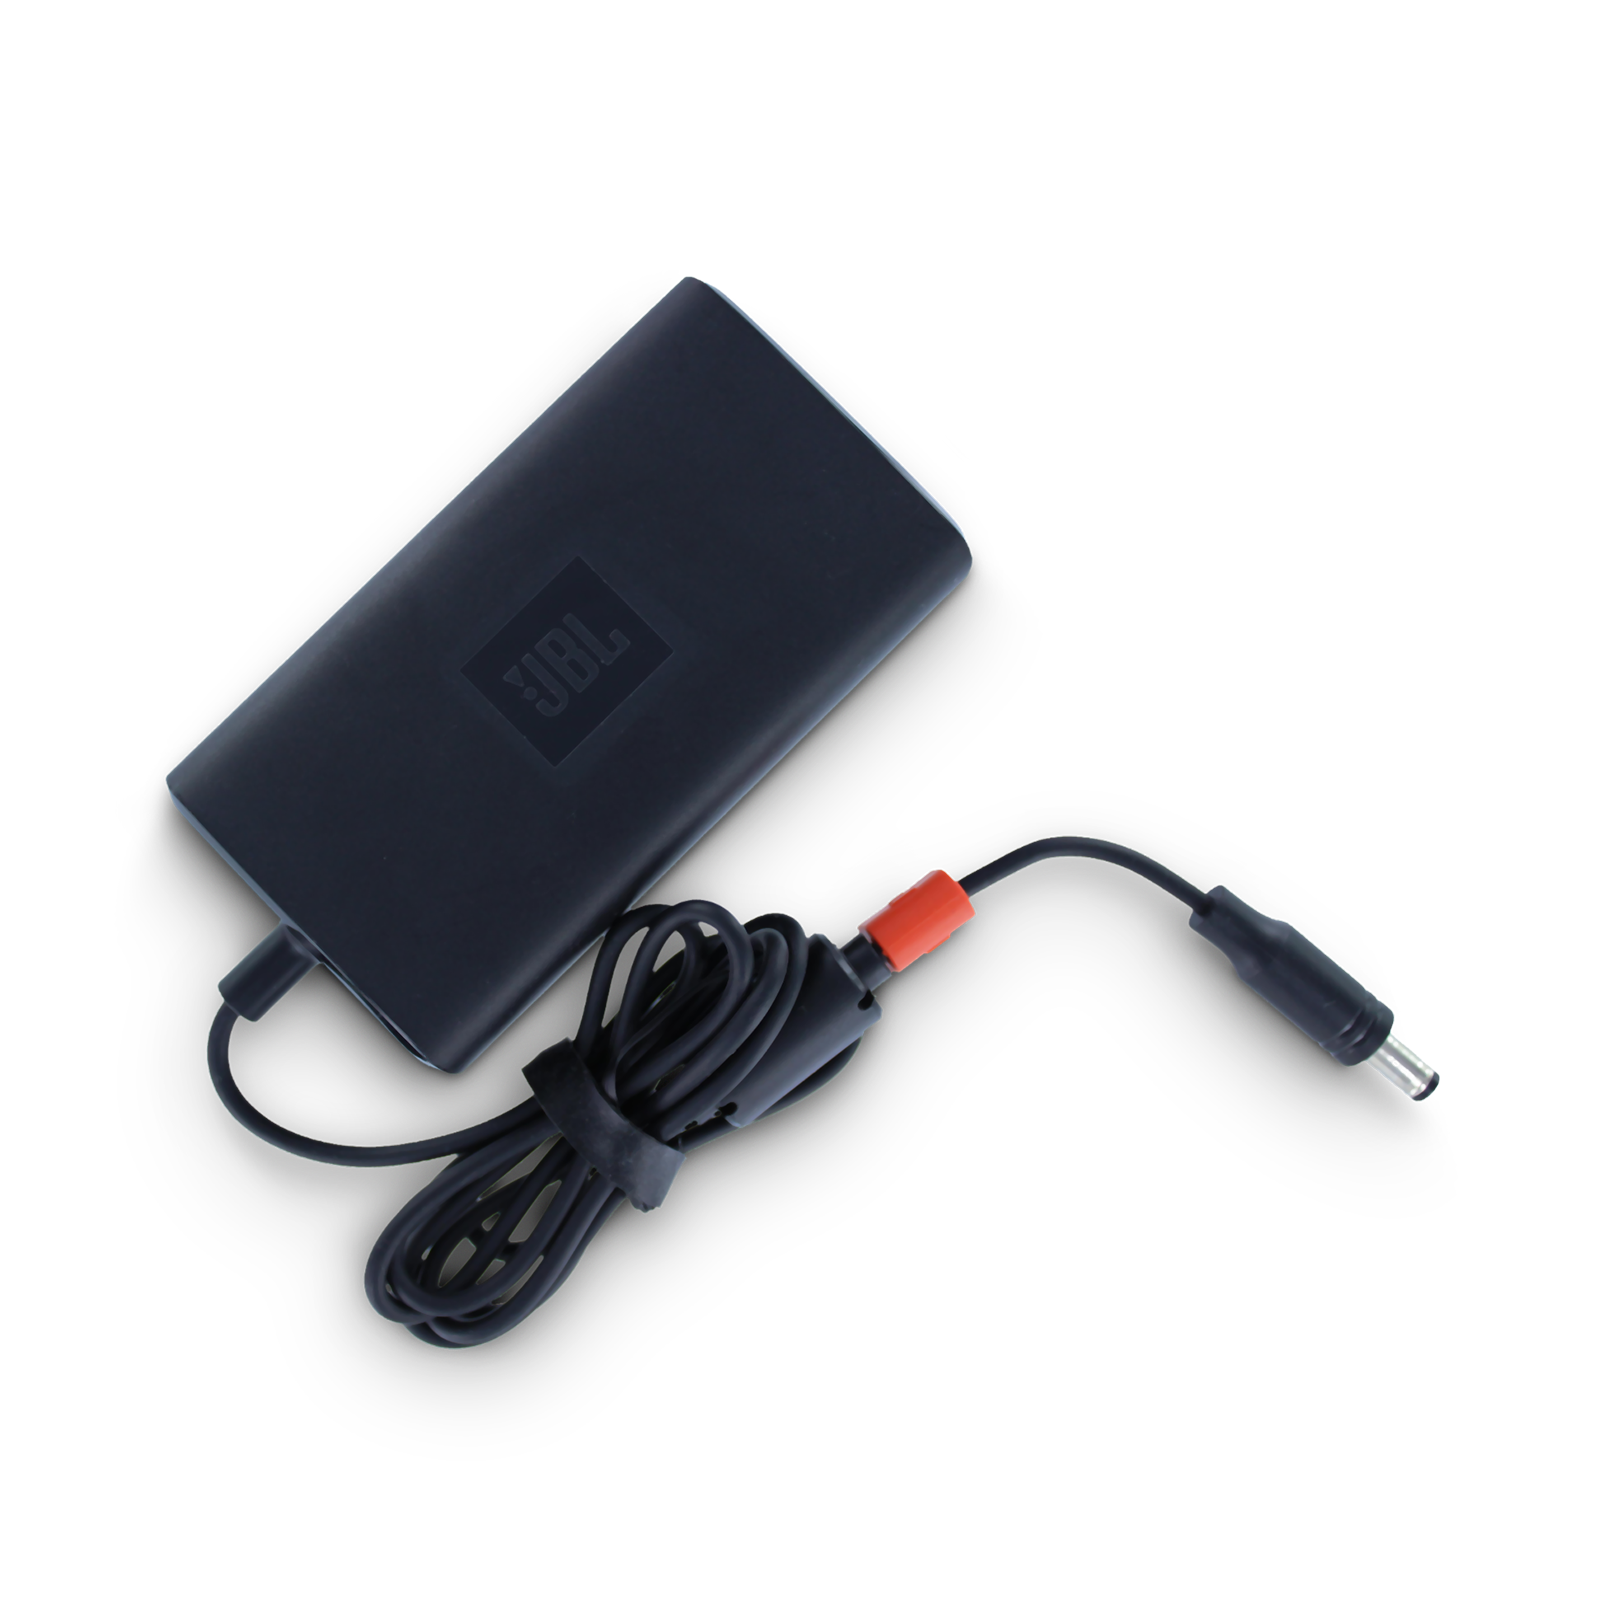 JBL Power adapter for Xtreme 2 - Black - Power adaptor - Hero